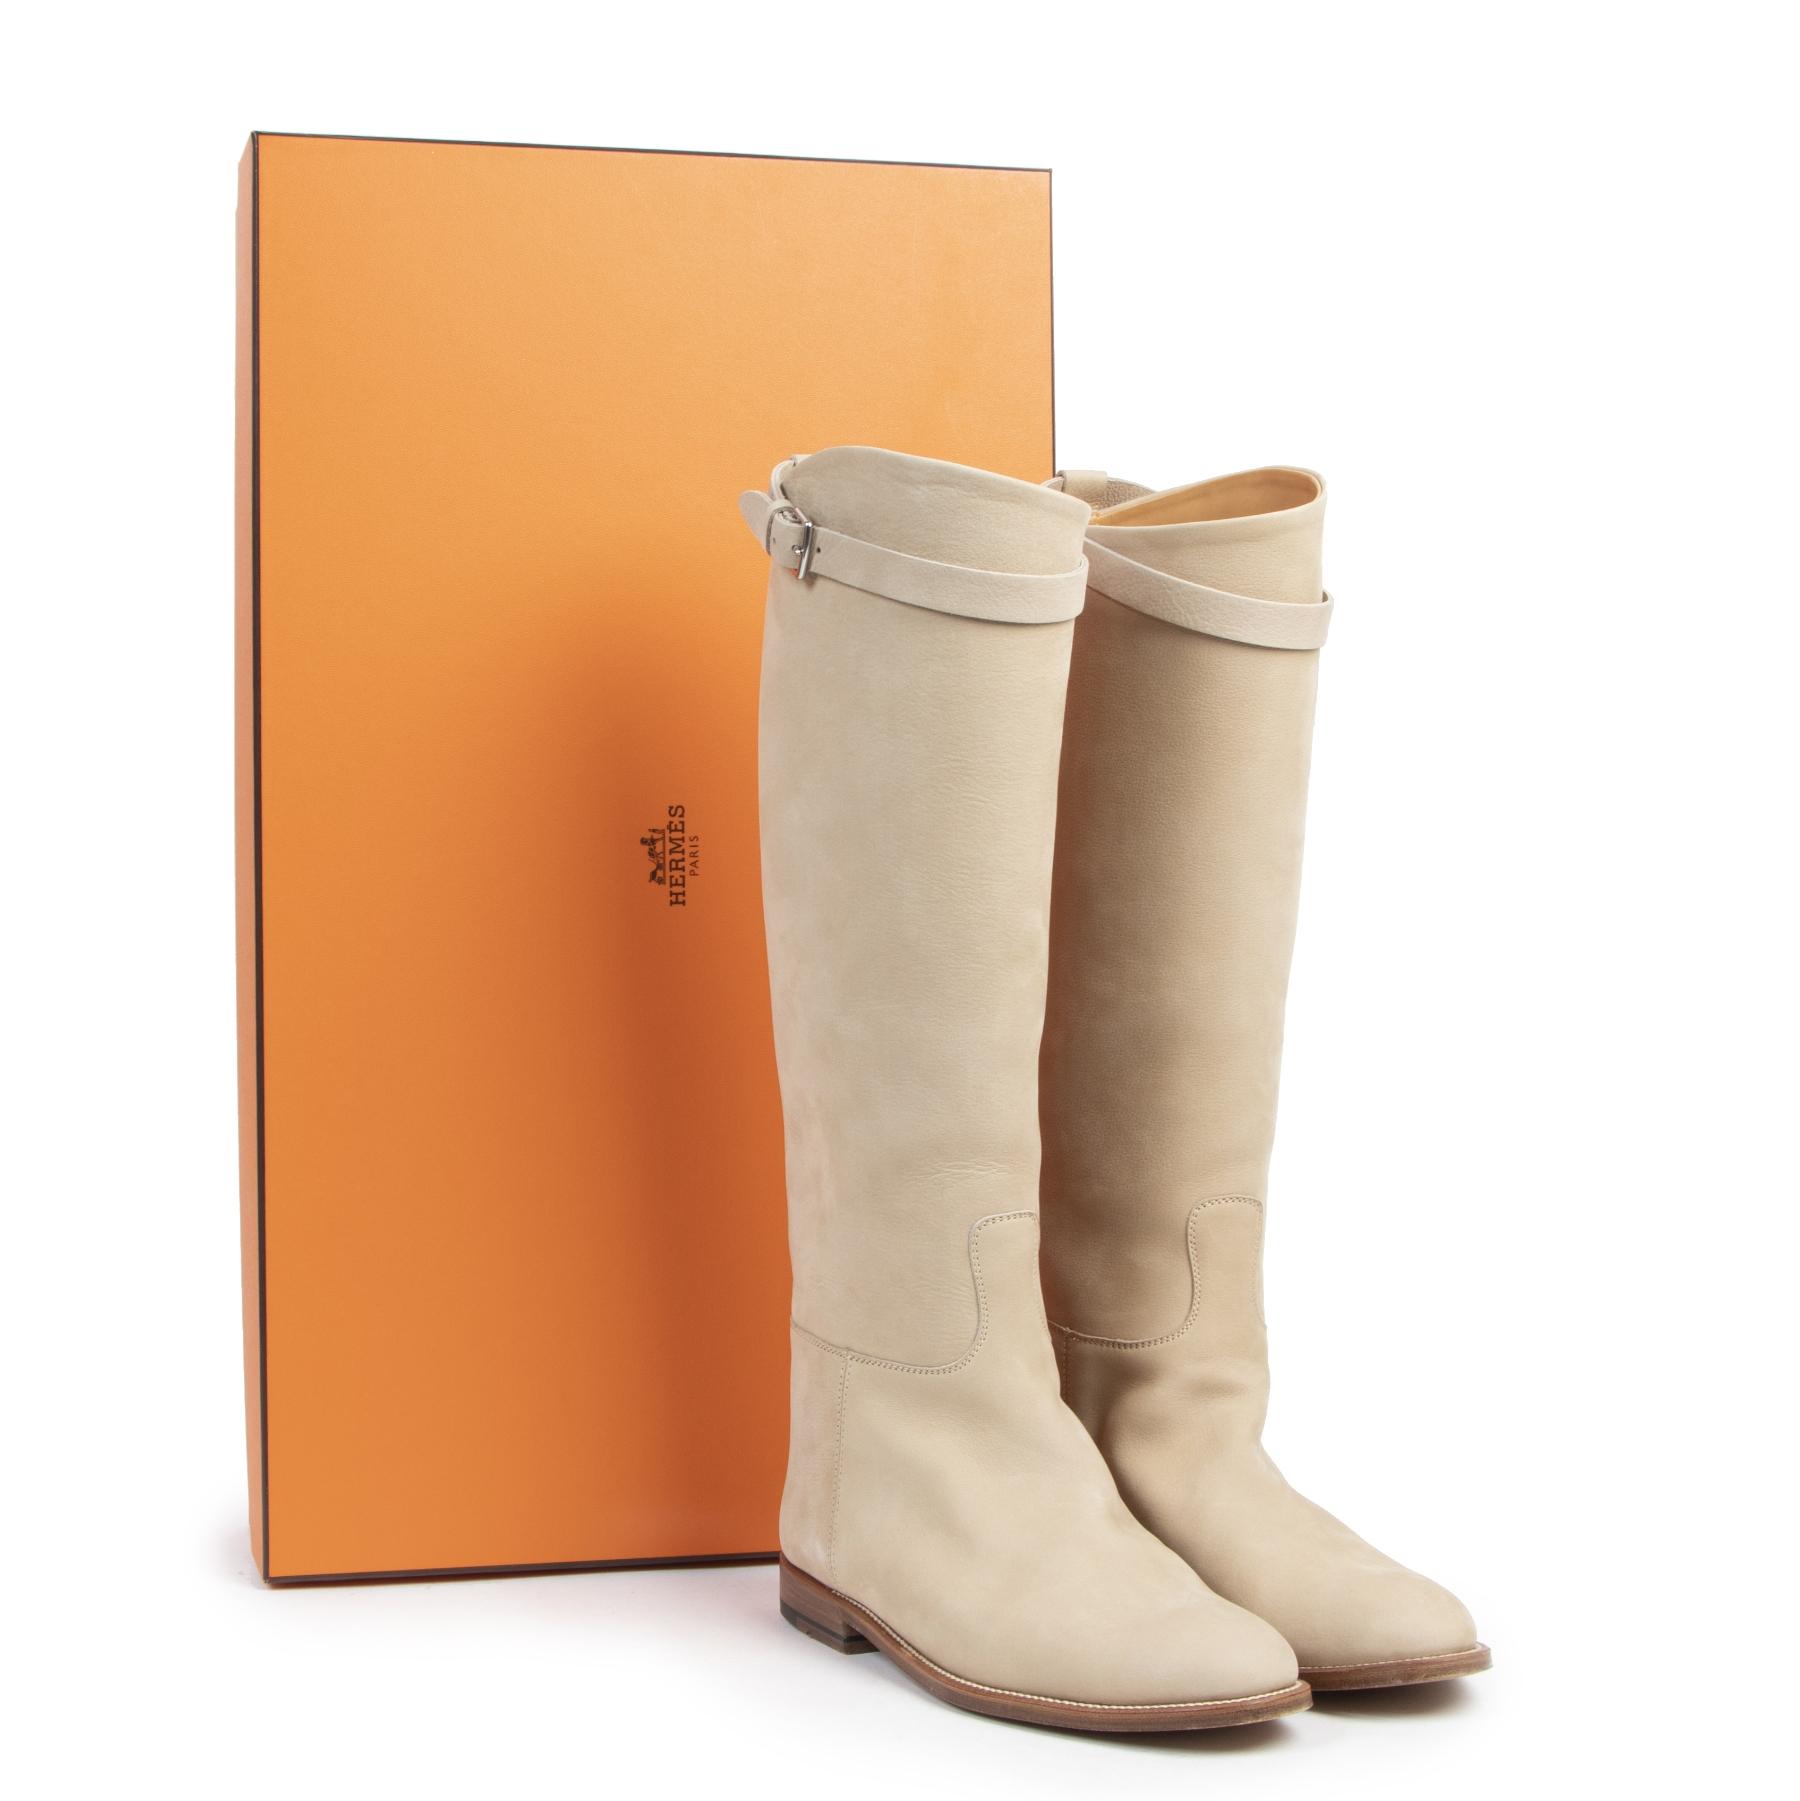 Authentieke tweedehands vintage Hermès Ecru Nubuck Jumping Riding Boots - Size 38 koop online webshop LabelLOV